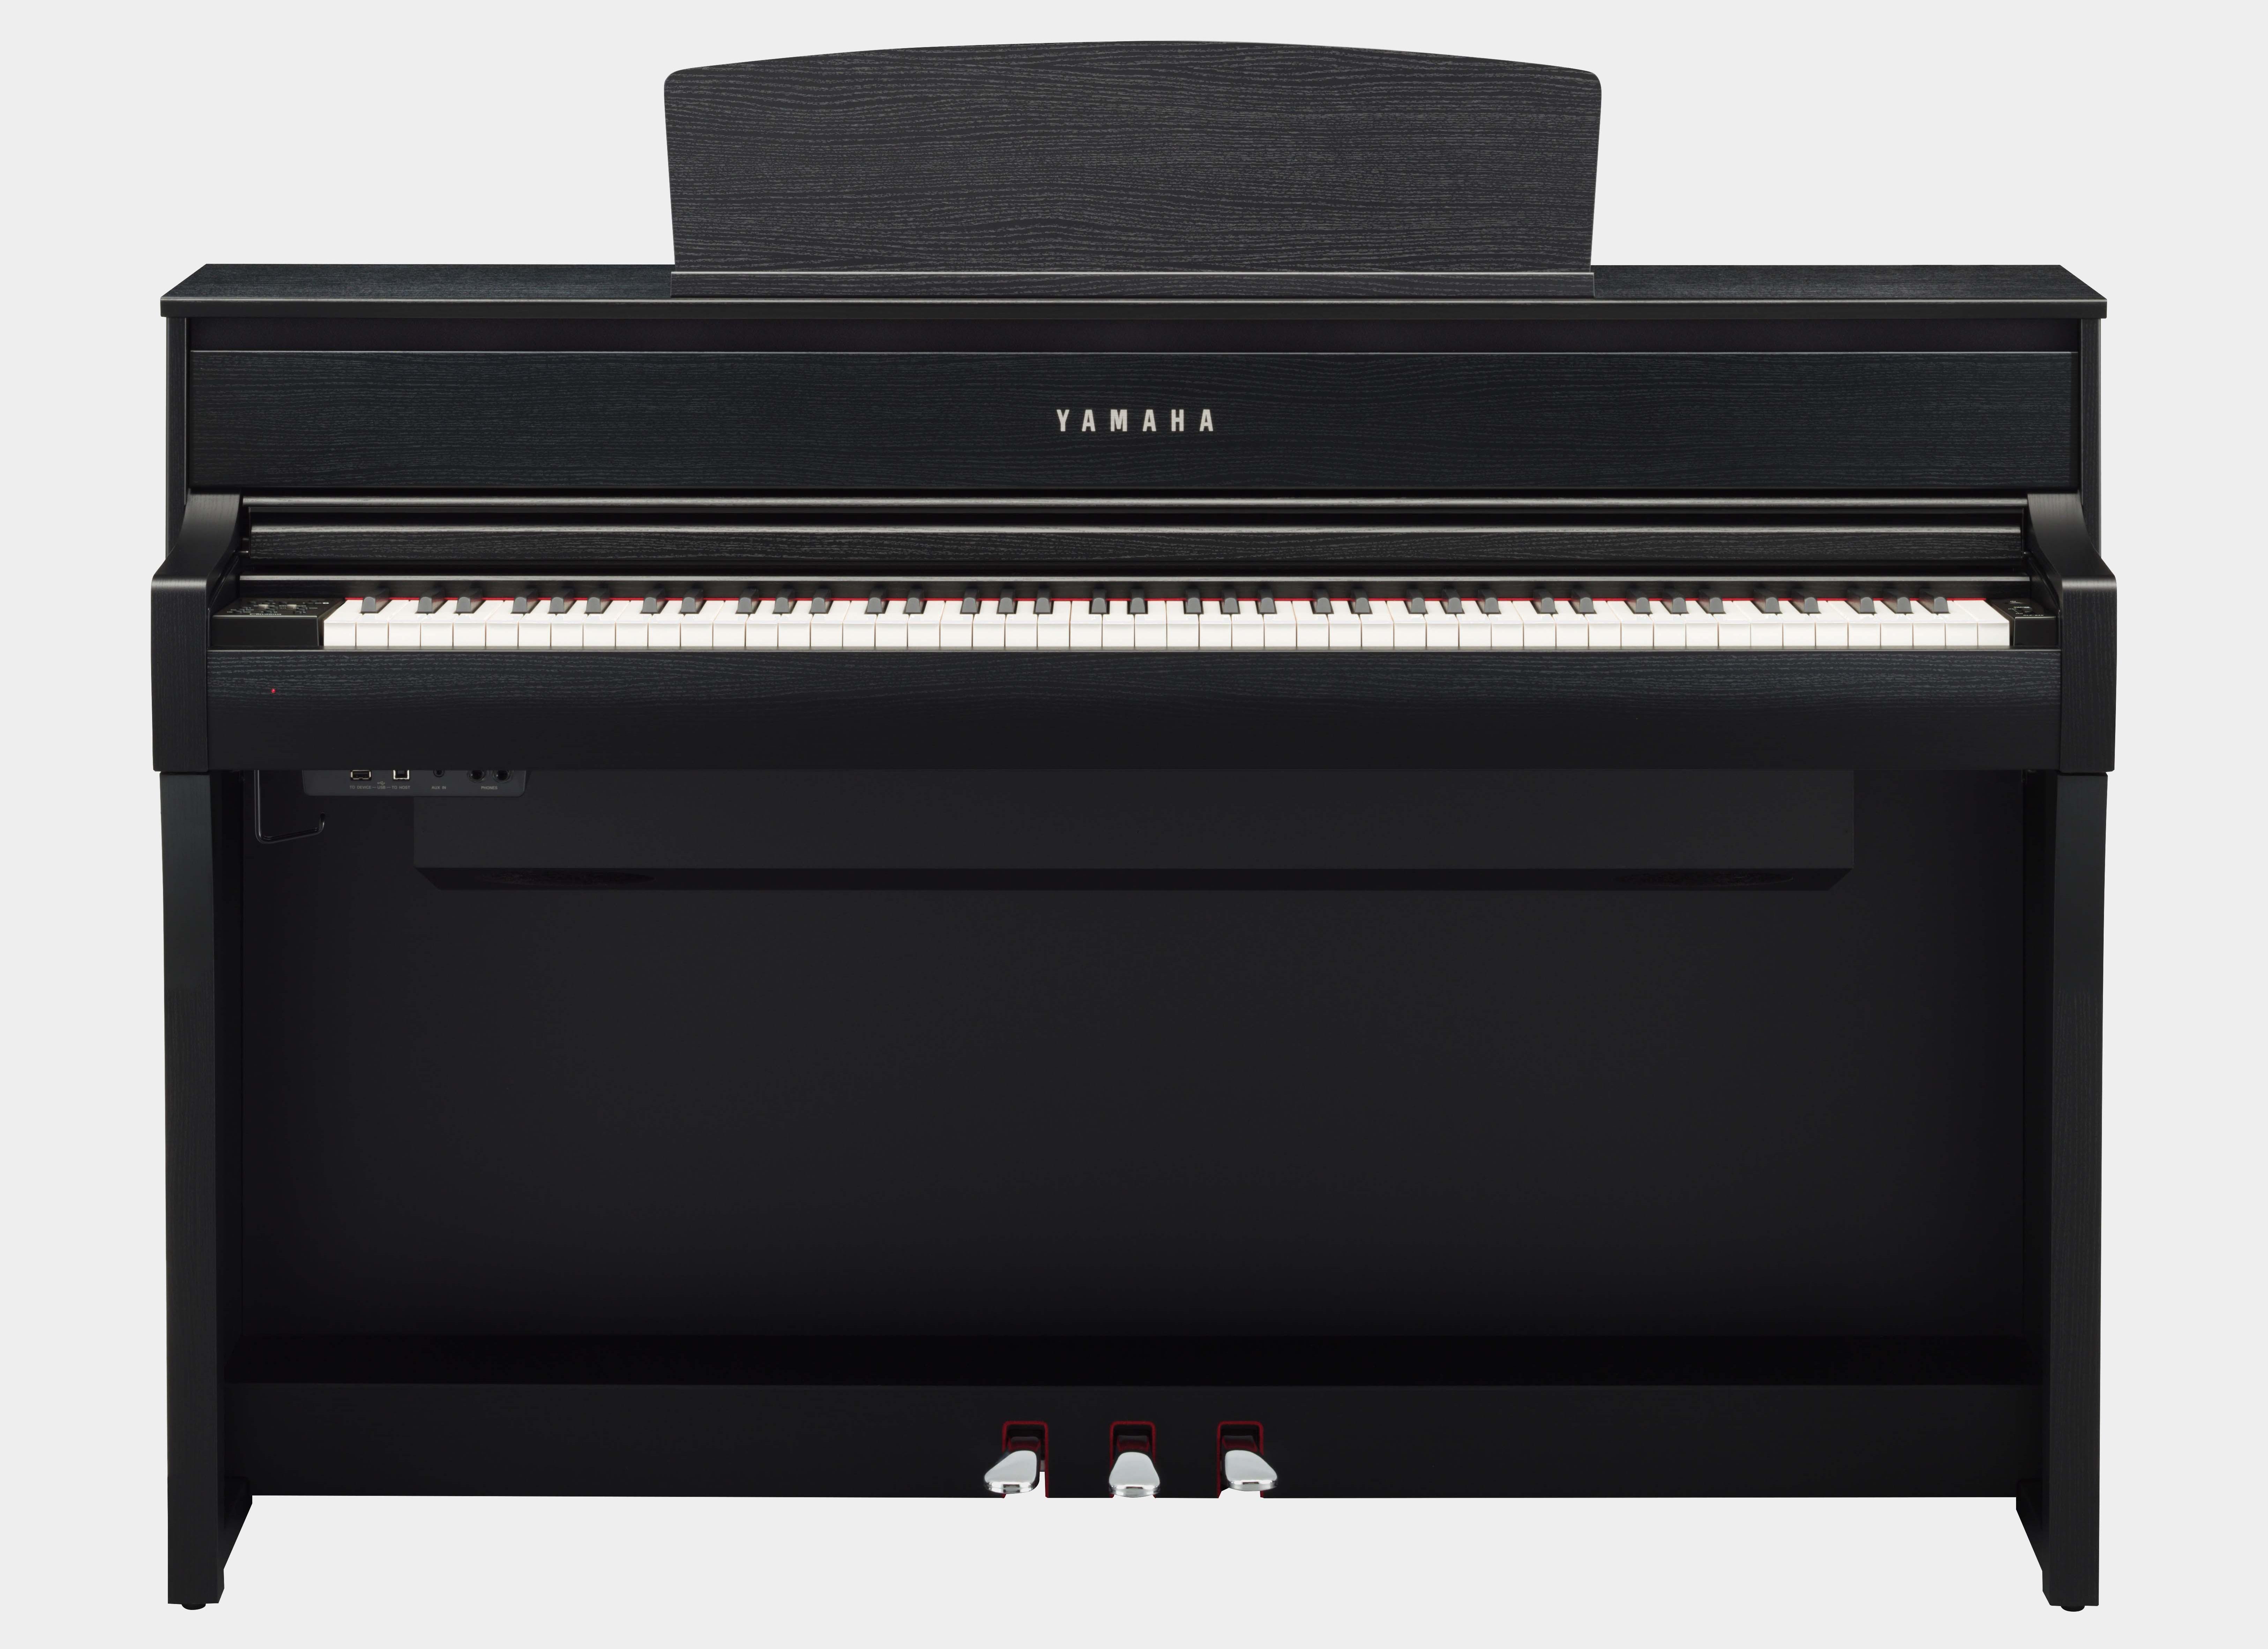 yamaha clavinova clp 675 b. Black Bedroom Furniture Sets. Home Design Ideas